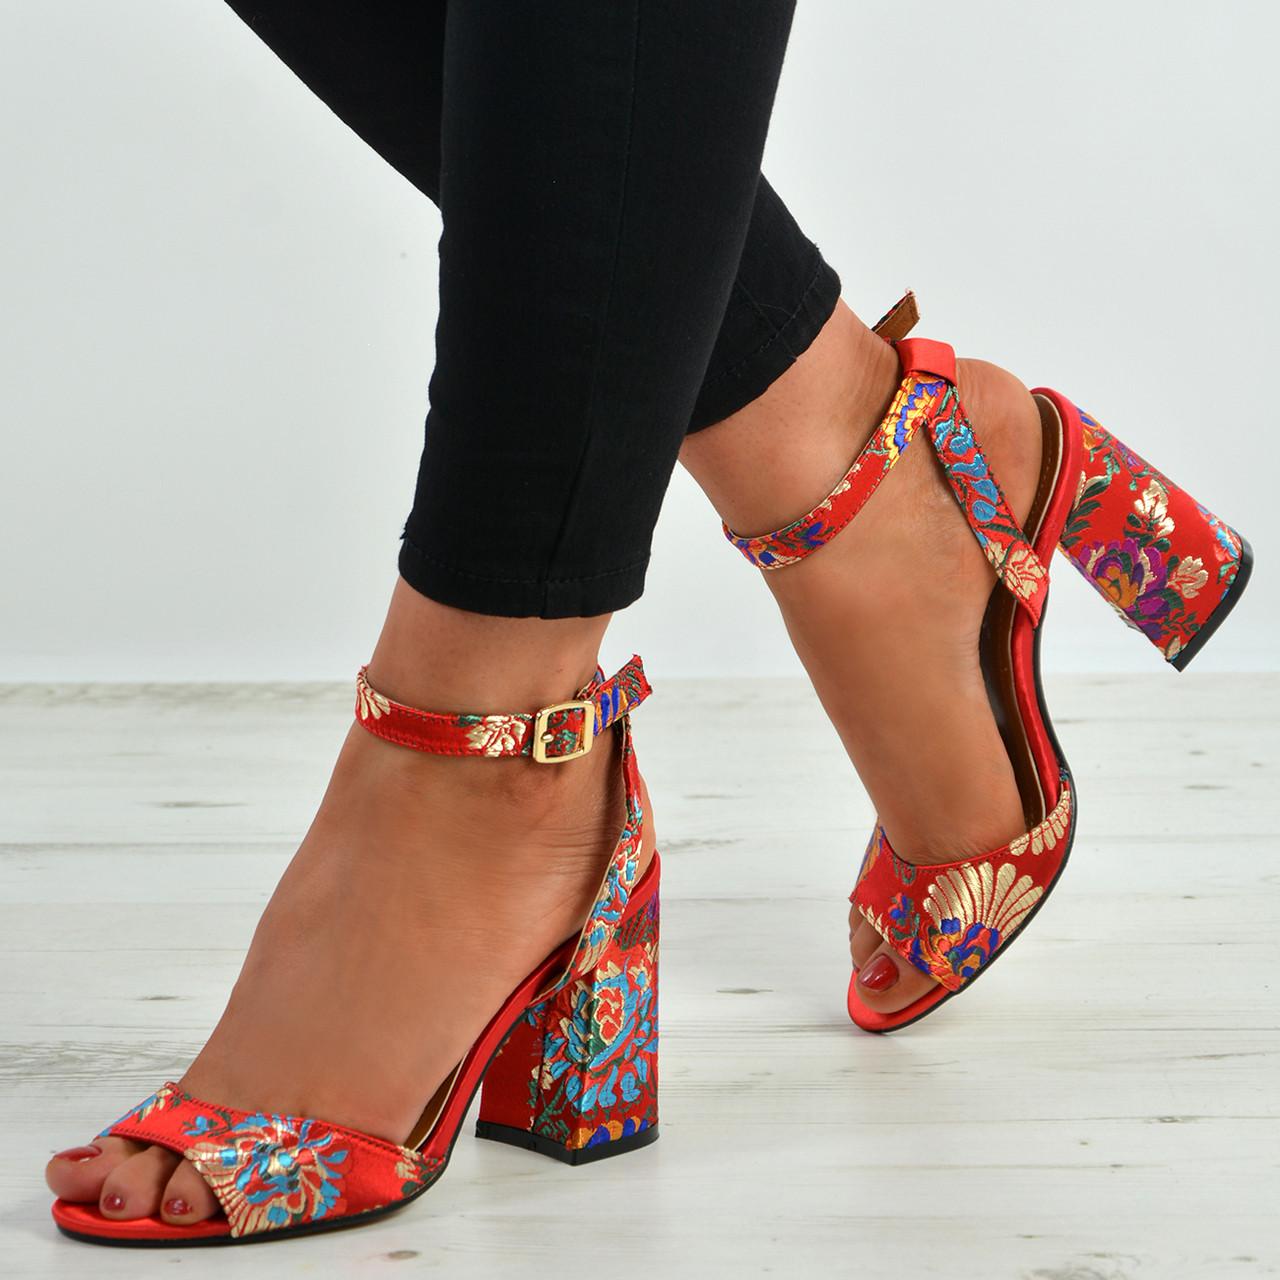 8fe9792f1b9 New Womens Ladies High Block Heel Peep Toe Floral Sandals Ankle ...